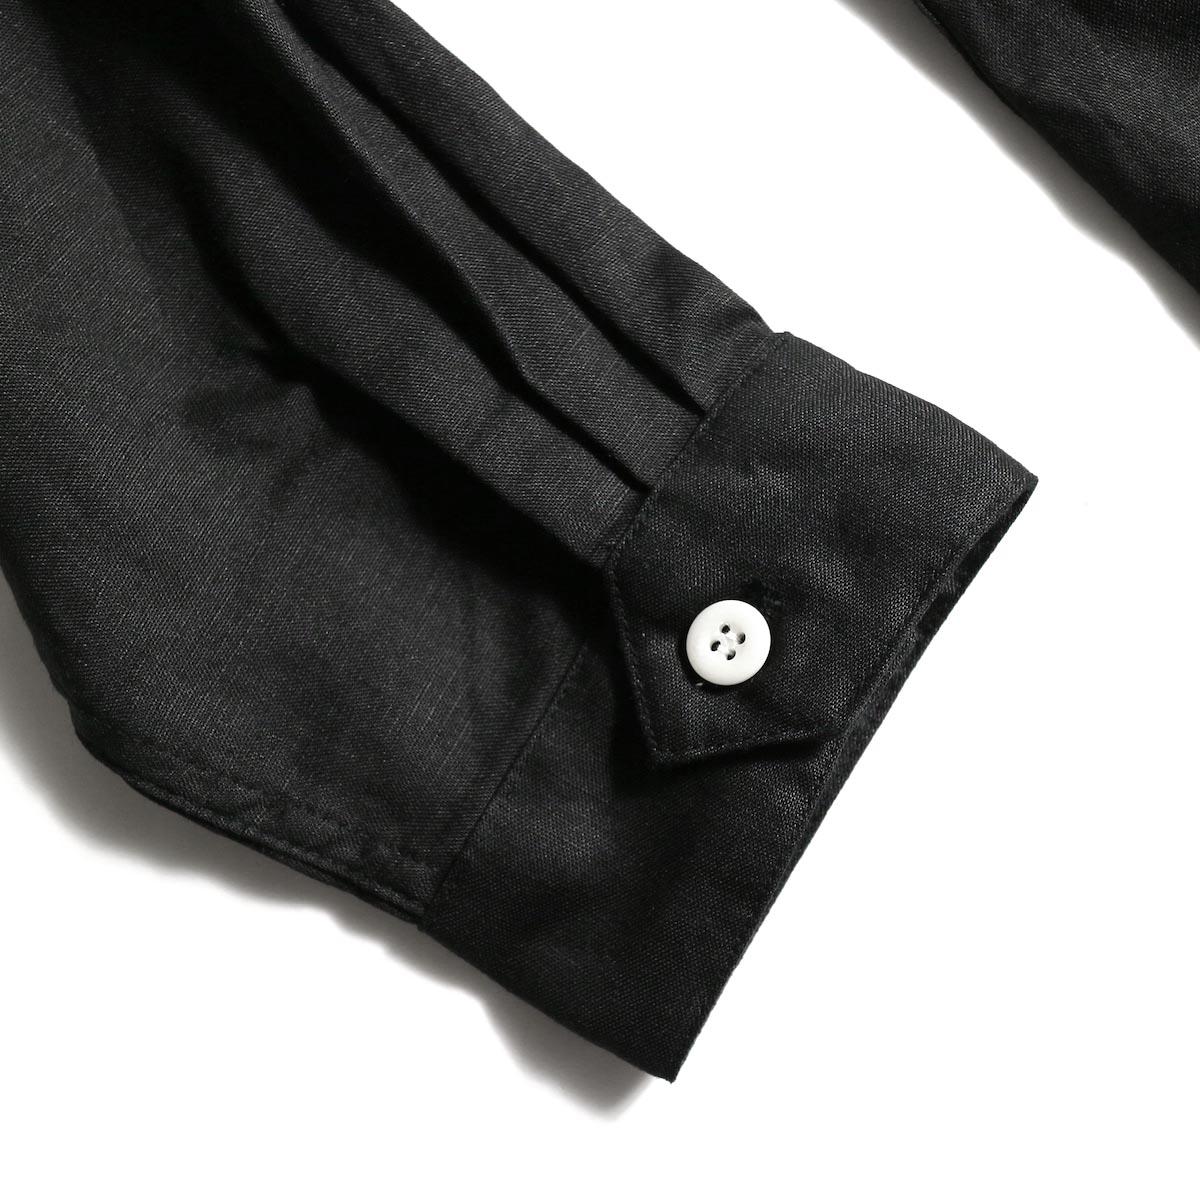 "FUTURE PRIMITIVE / FP HARRINGTON JKT ""LINEN"" (Black)袖"